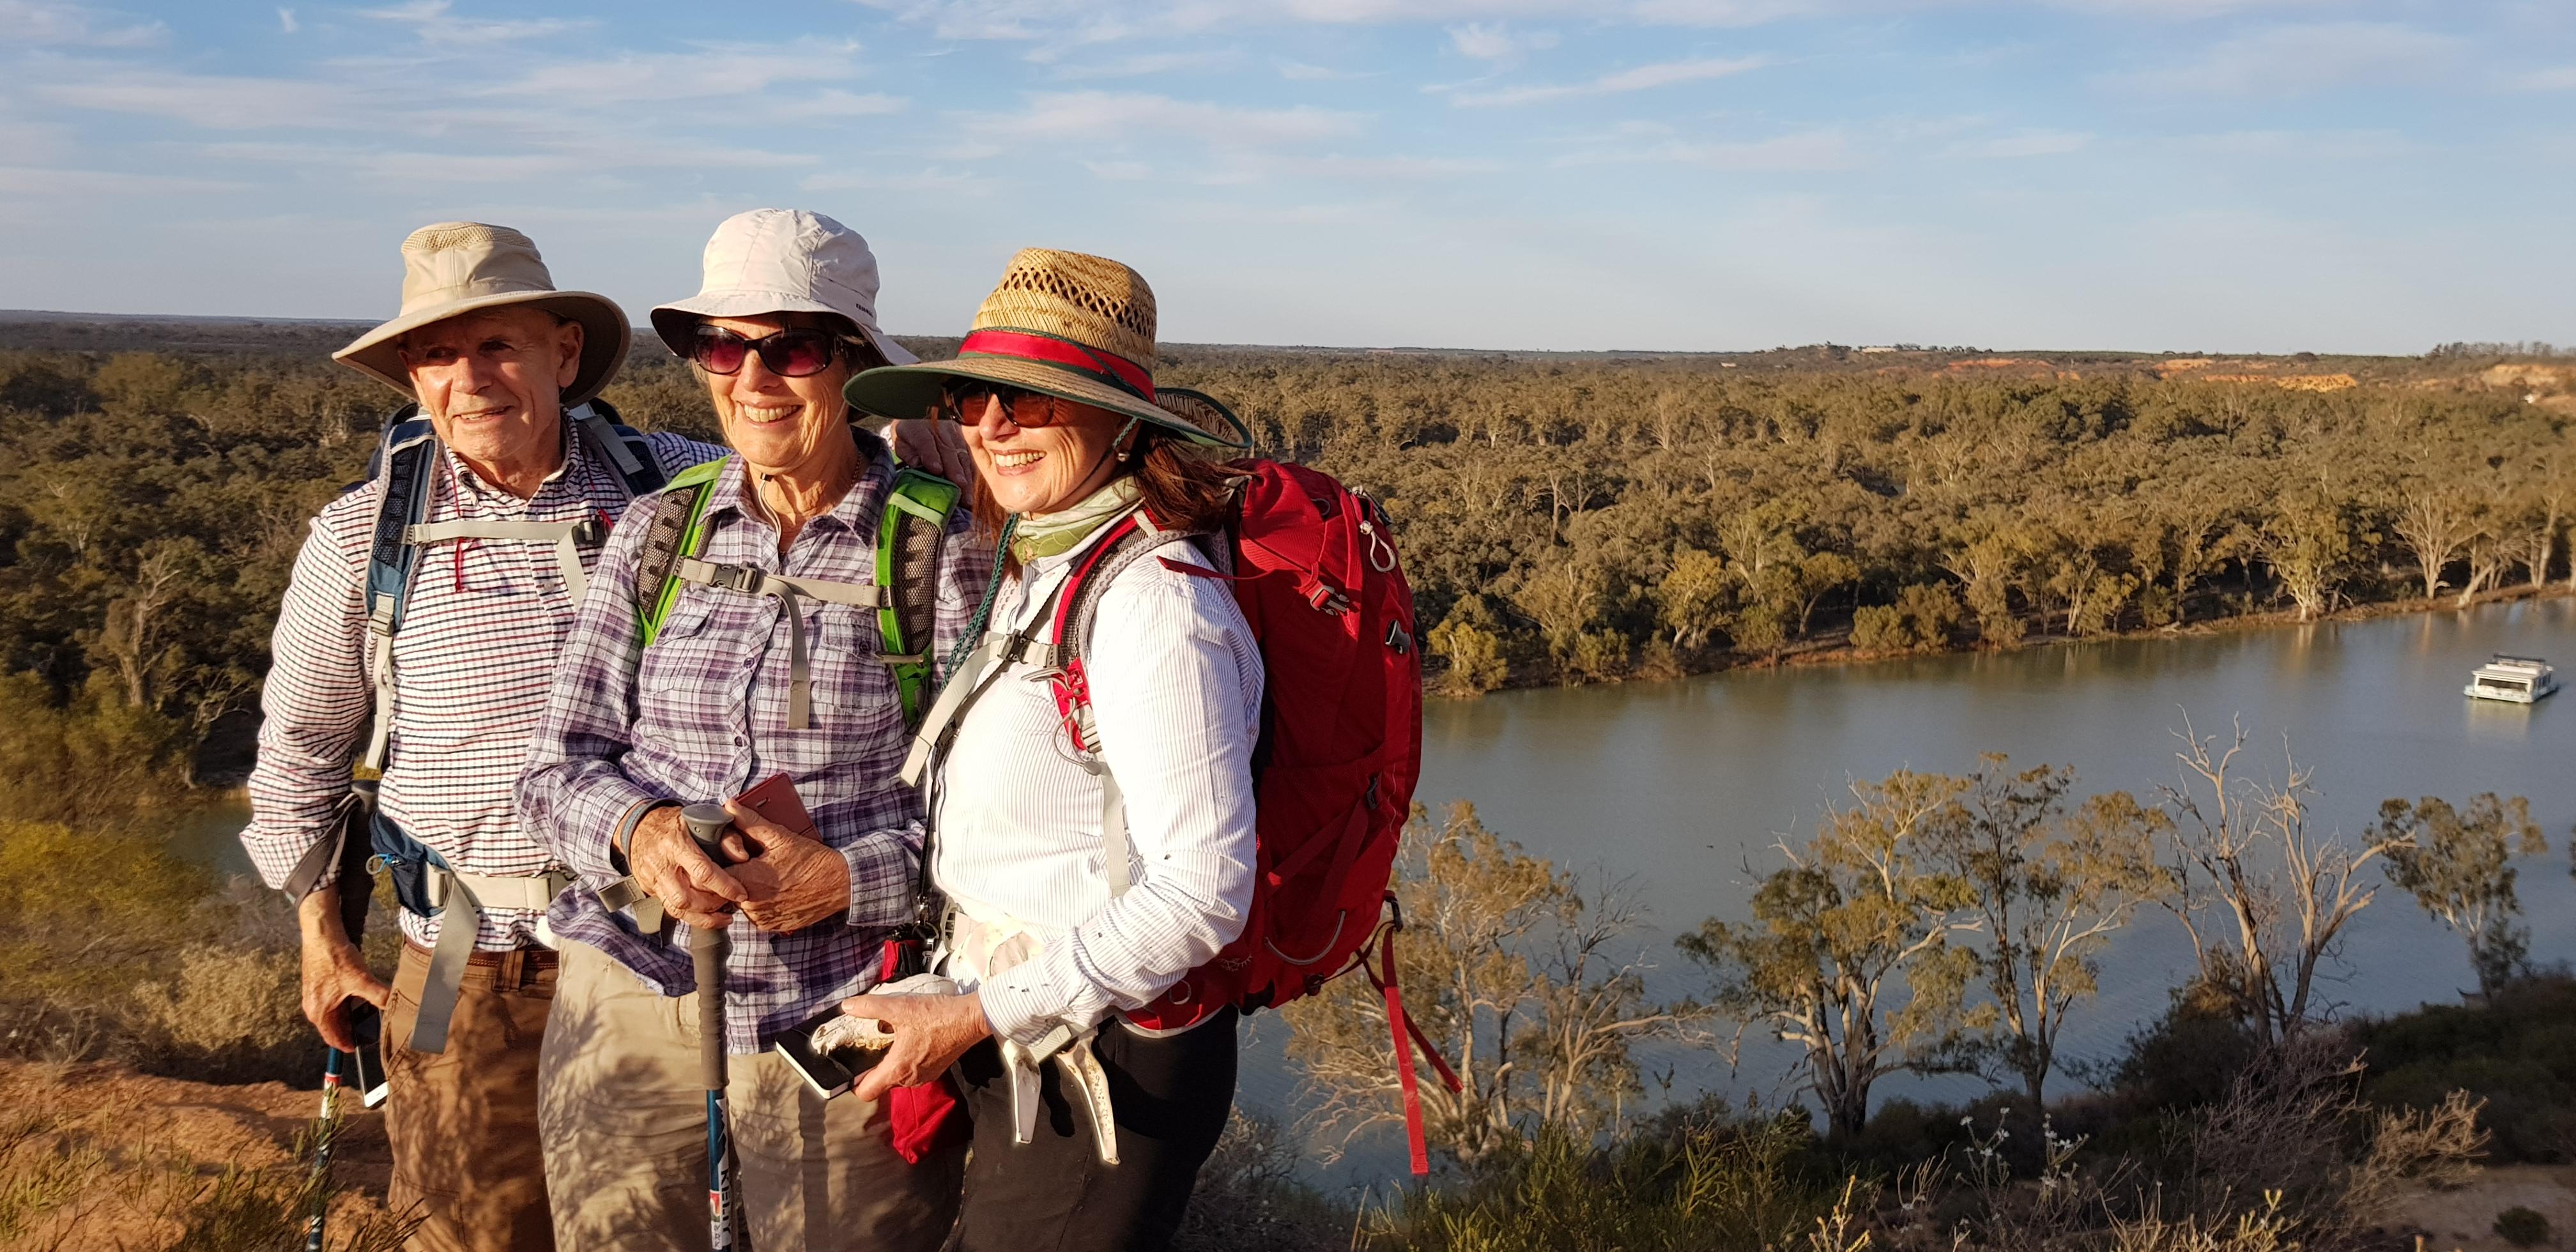 Enjoying the Murray River